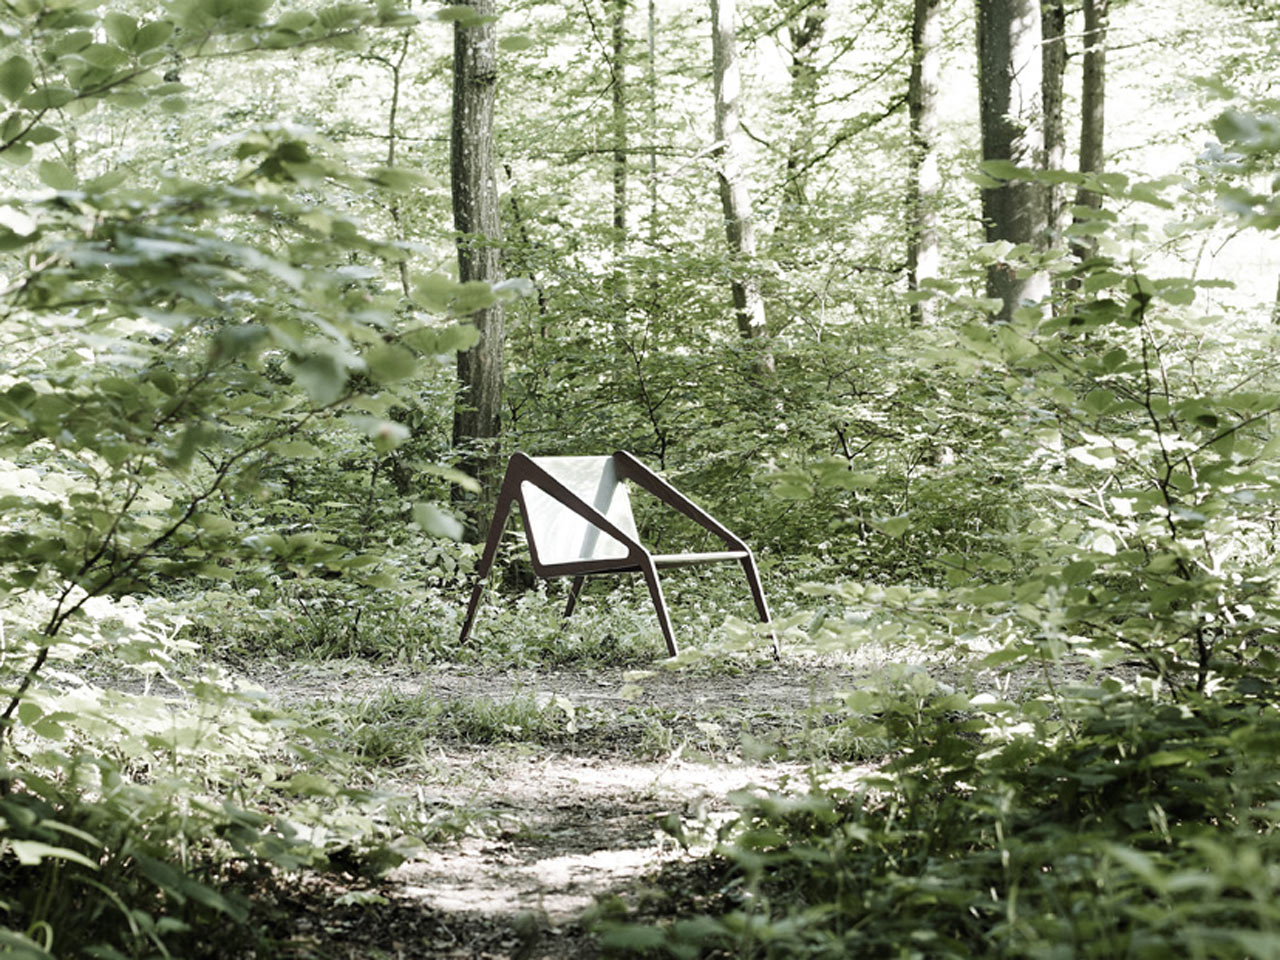 studioforma_arachnide-spider-chair-3a